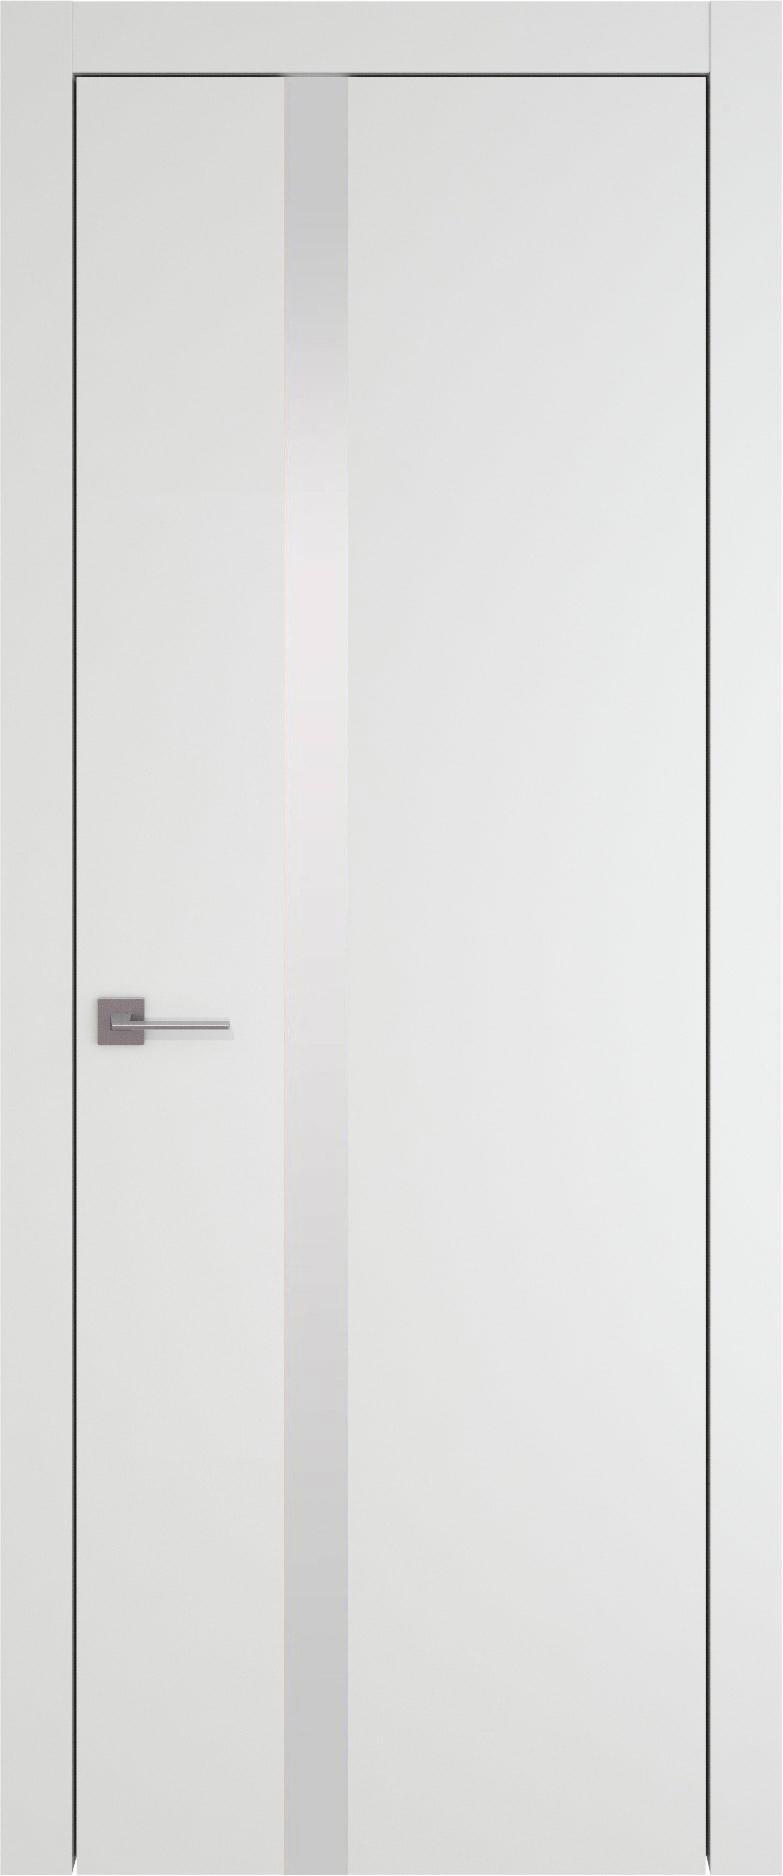 Tivoli Д-1 цвет - Белая эмаль (RAL 9003) Без стекла (ДГ)